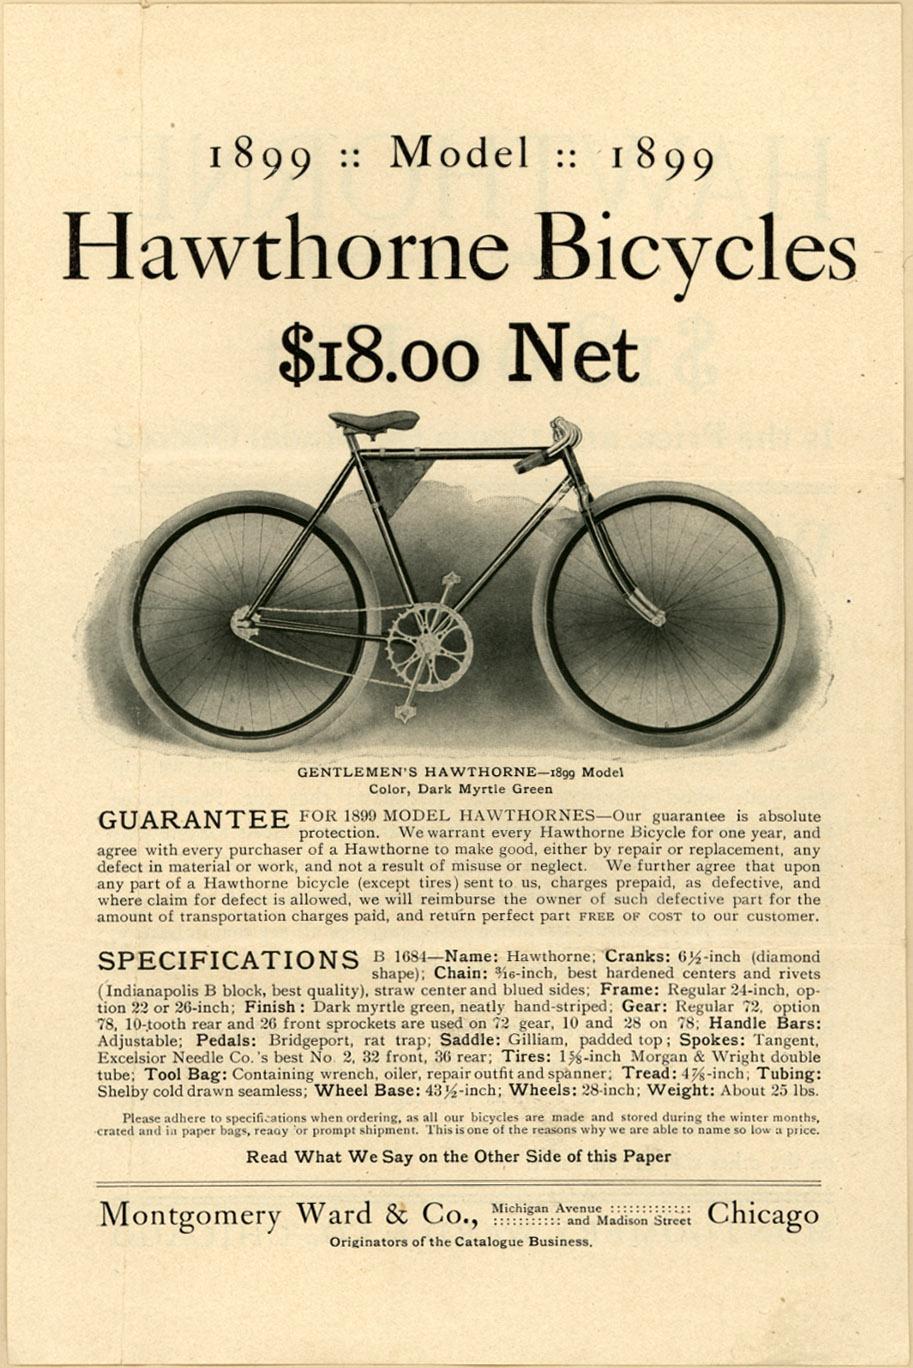 Montgomery Ward & Co. 1899